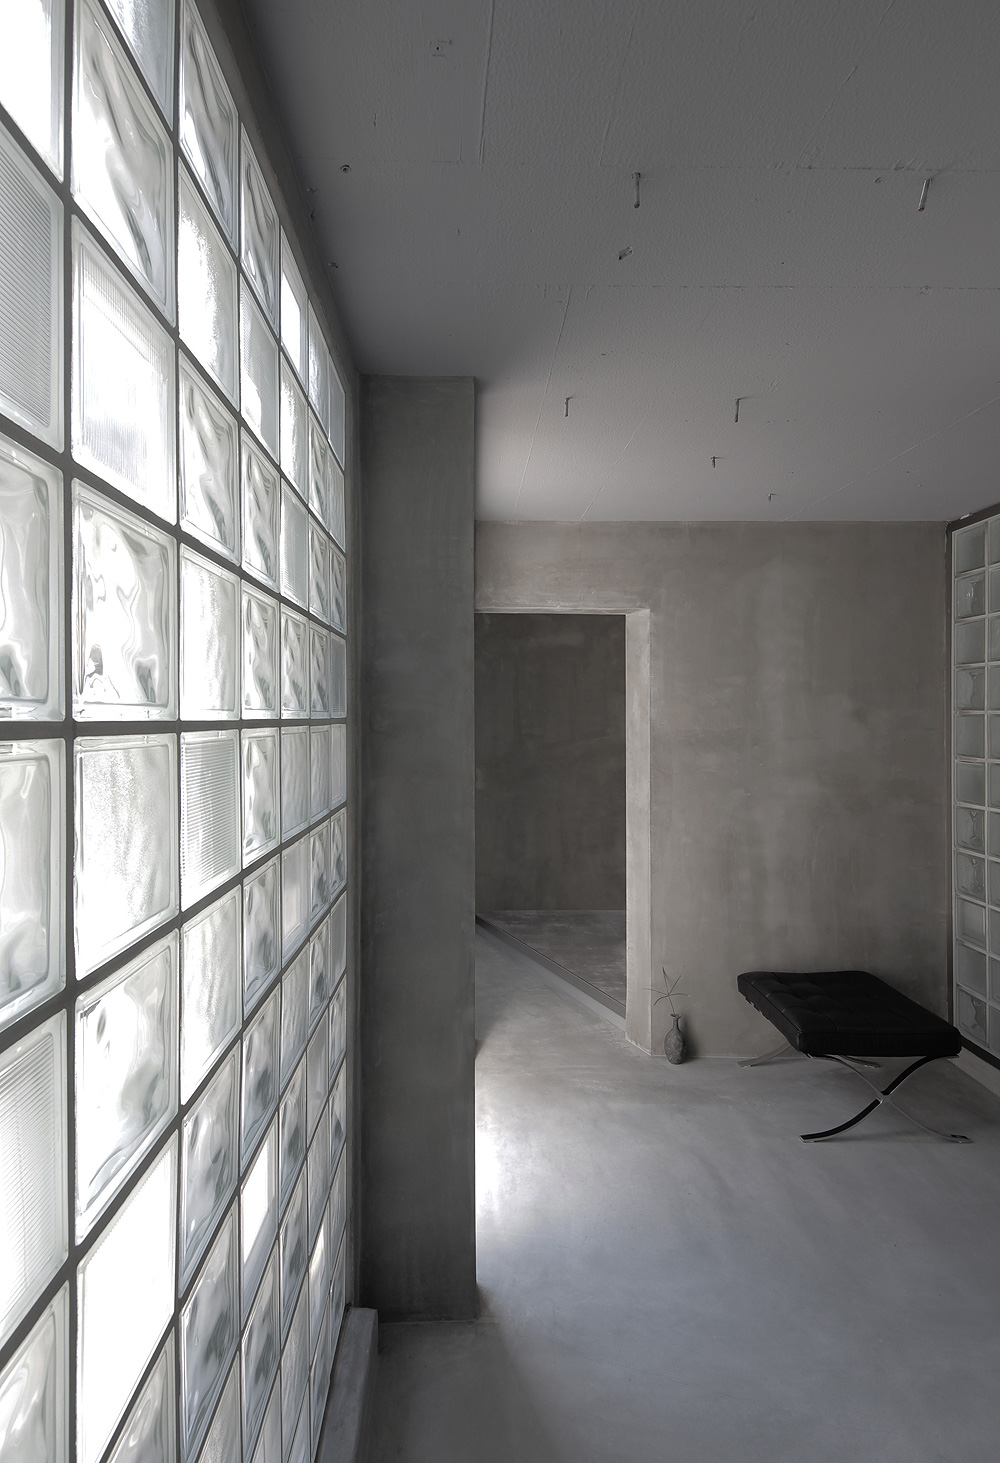 vivienda y galeria de arte jun murata (10)